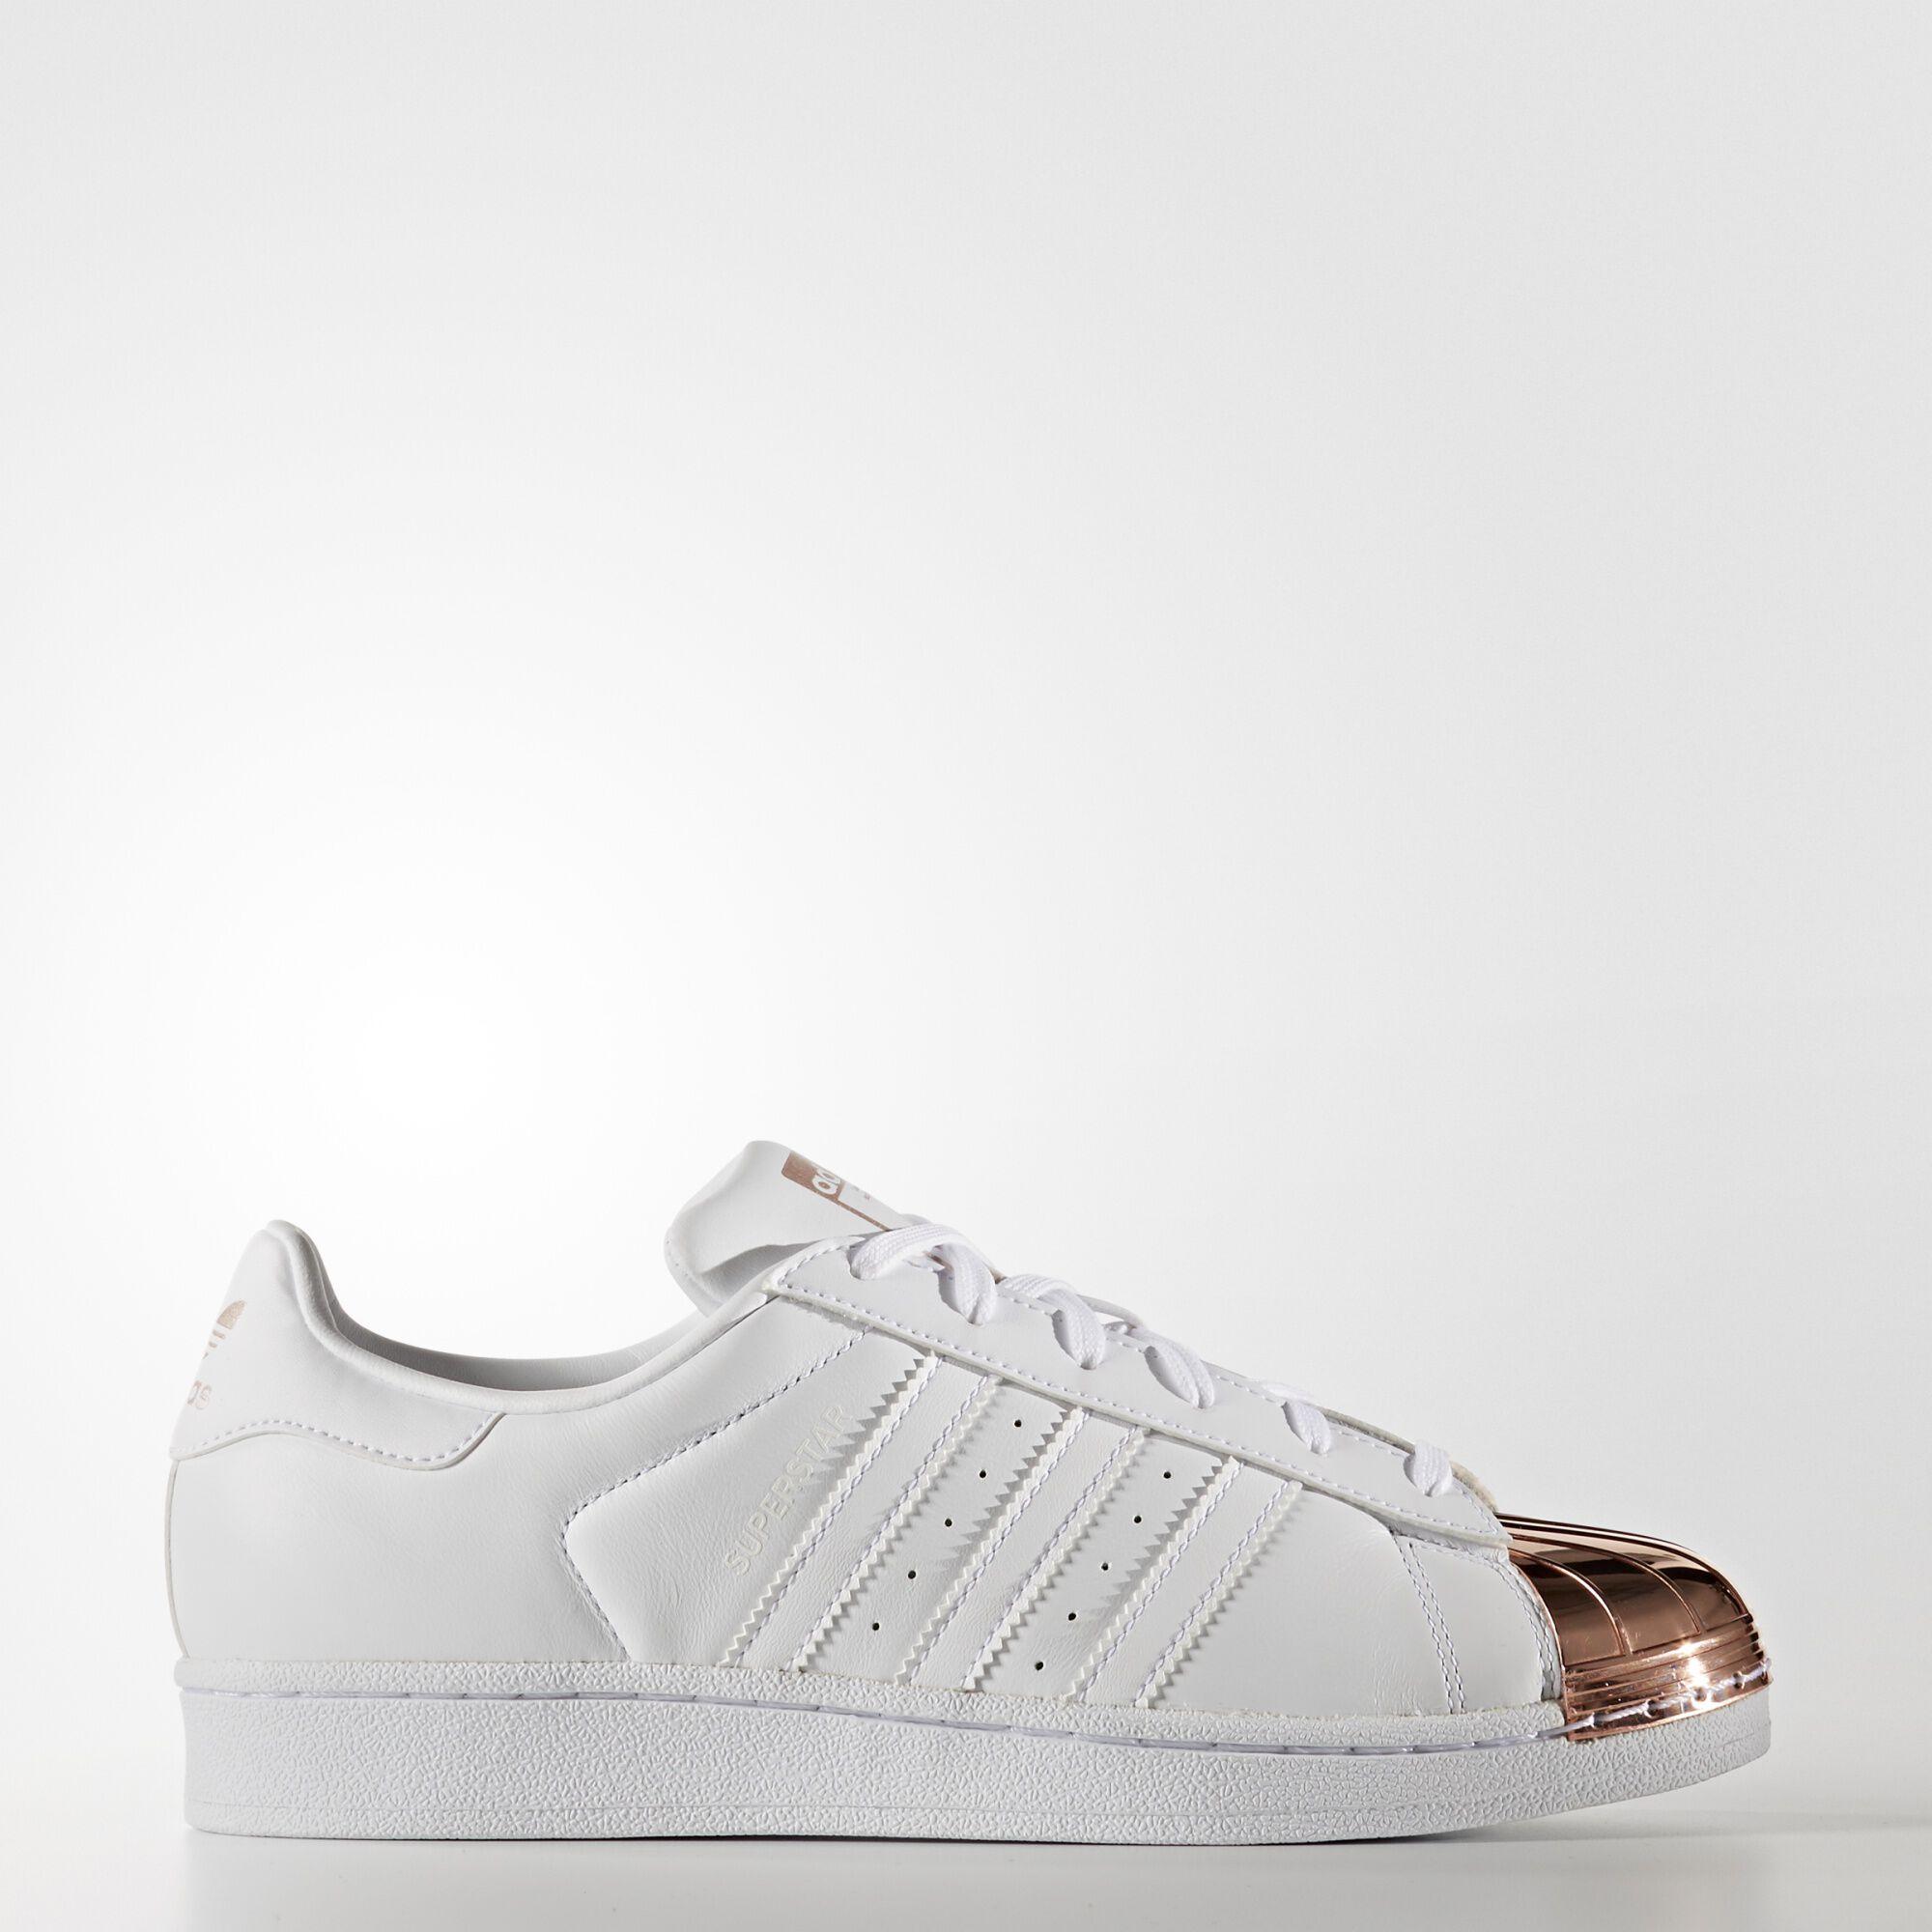 Best White Superstar Ideas Pinterest Adidas 25 On About wXn80OPk